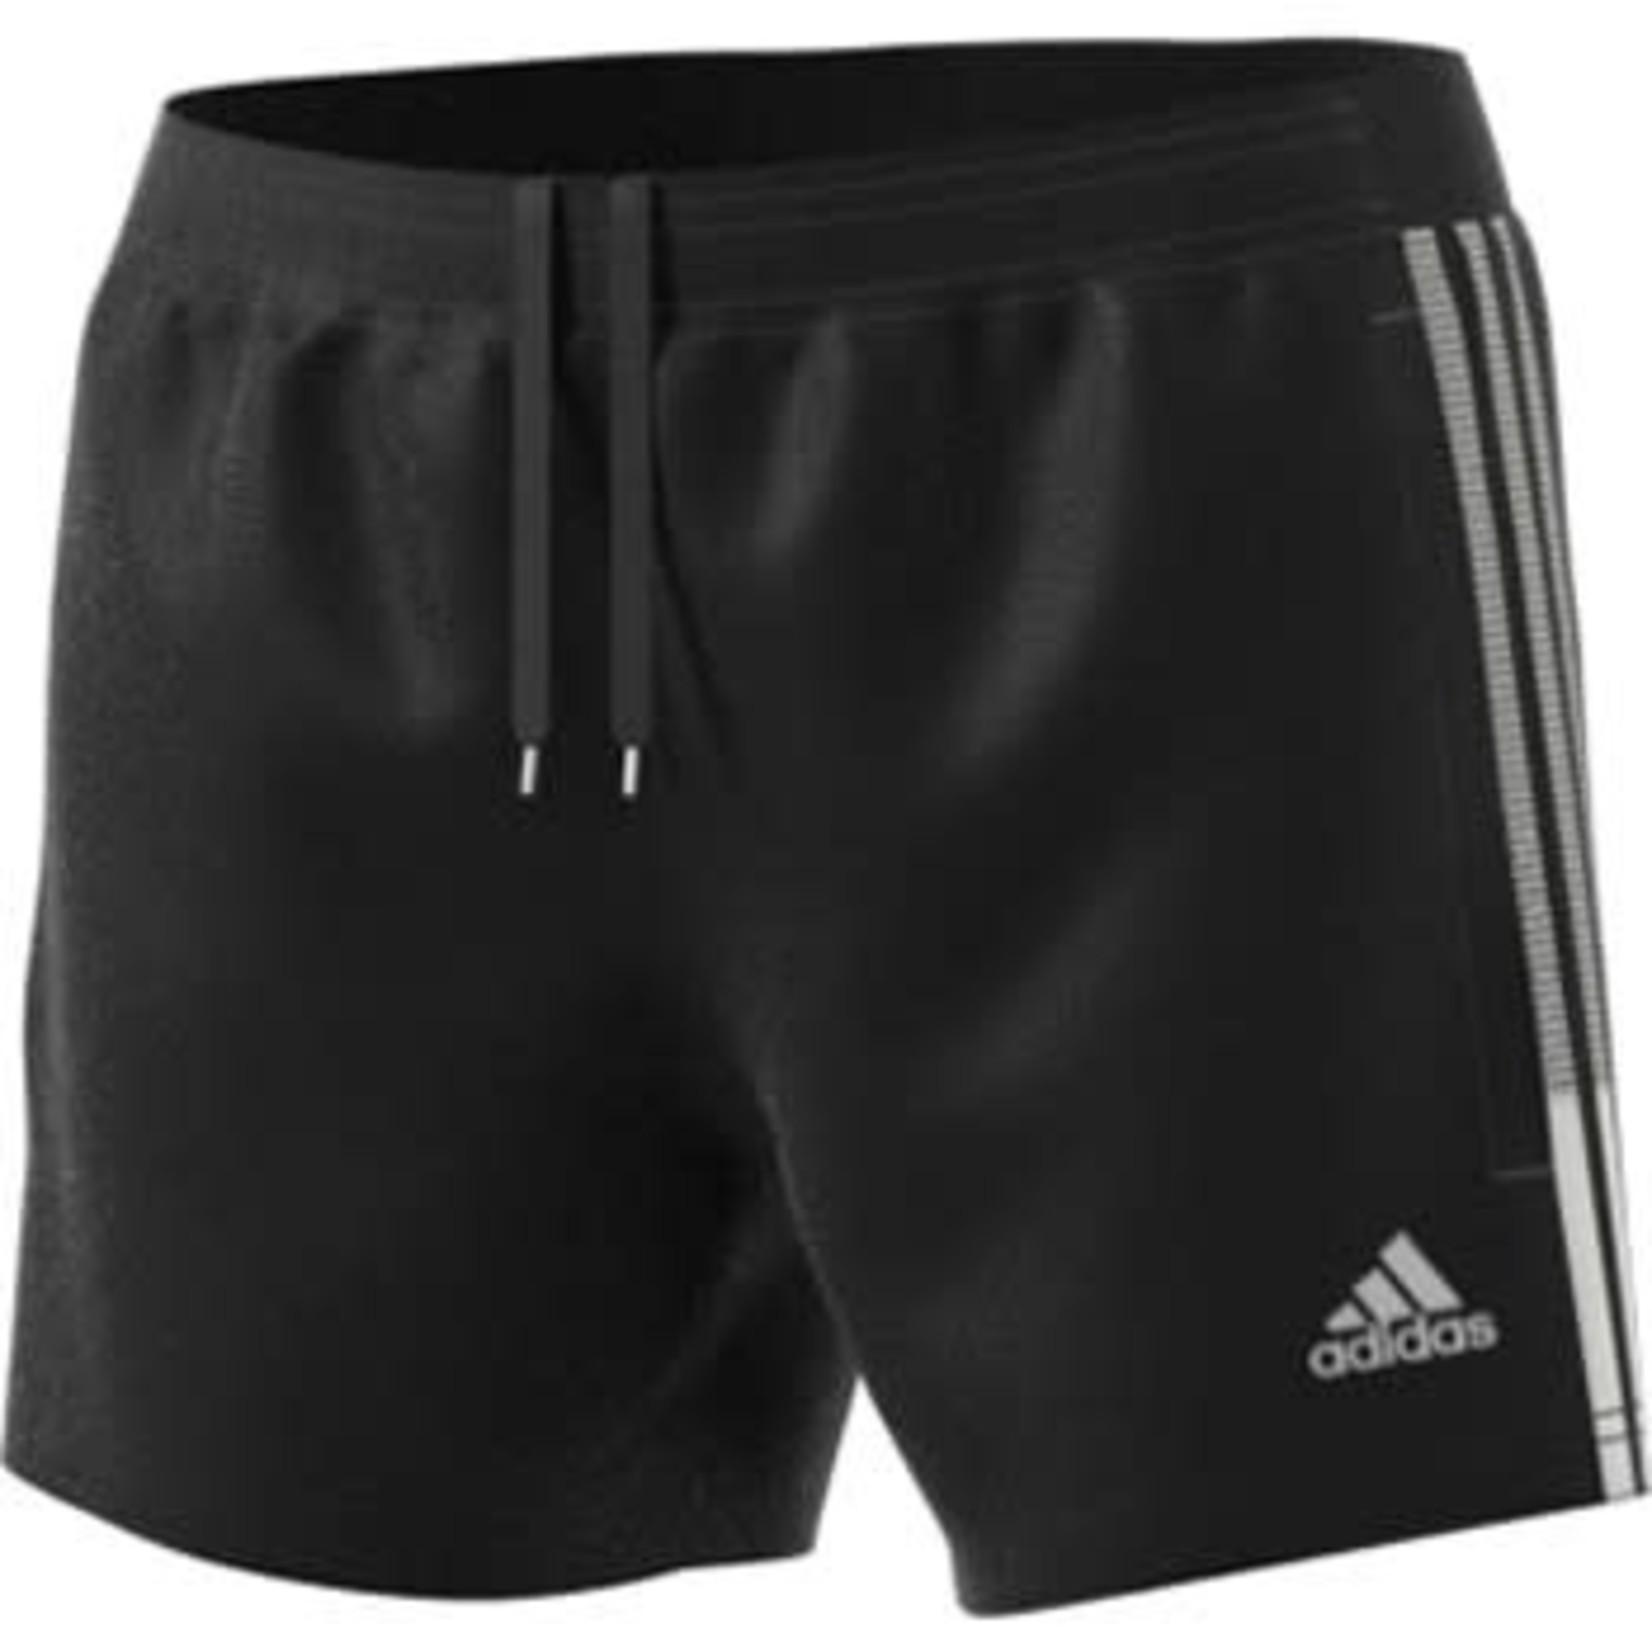 Adidas Adidas Shorts, Tiro21 TR, Ladies